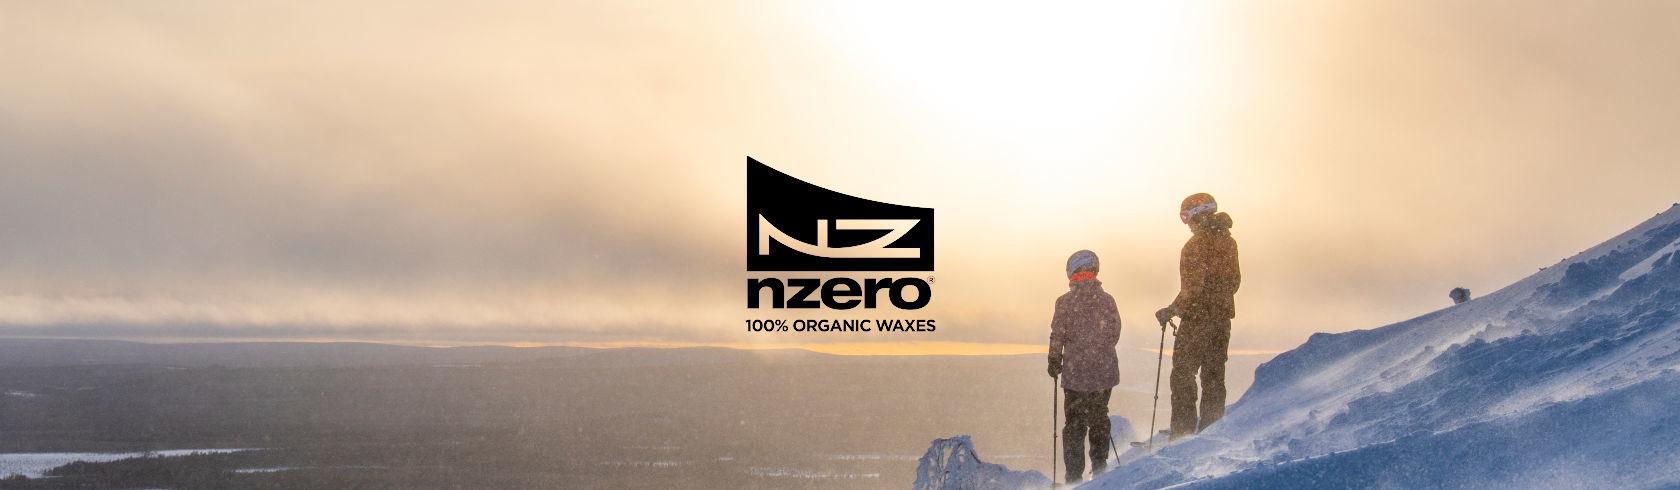 Nzero brand logo